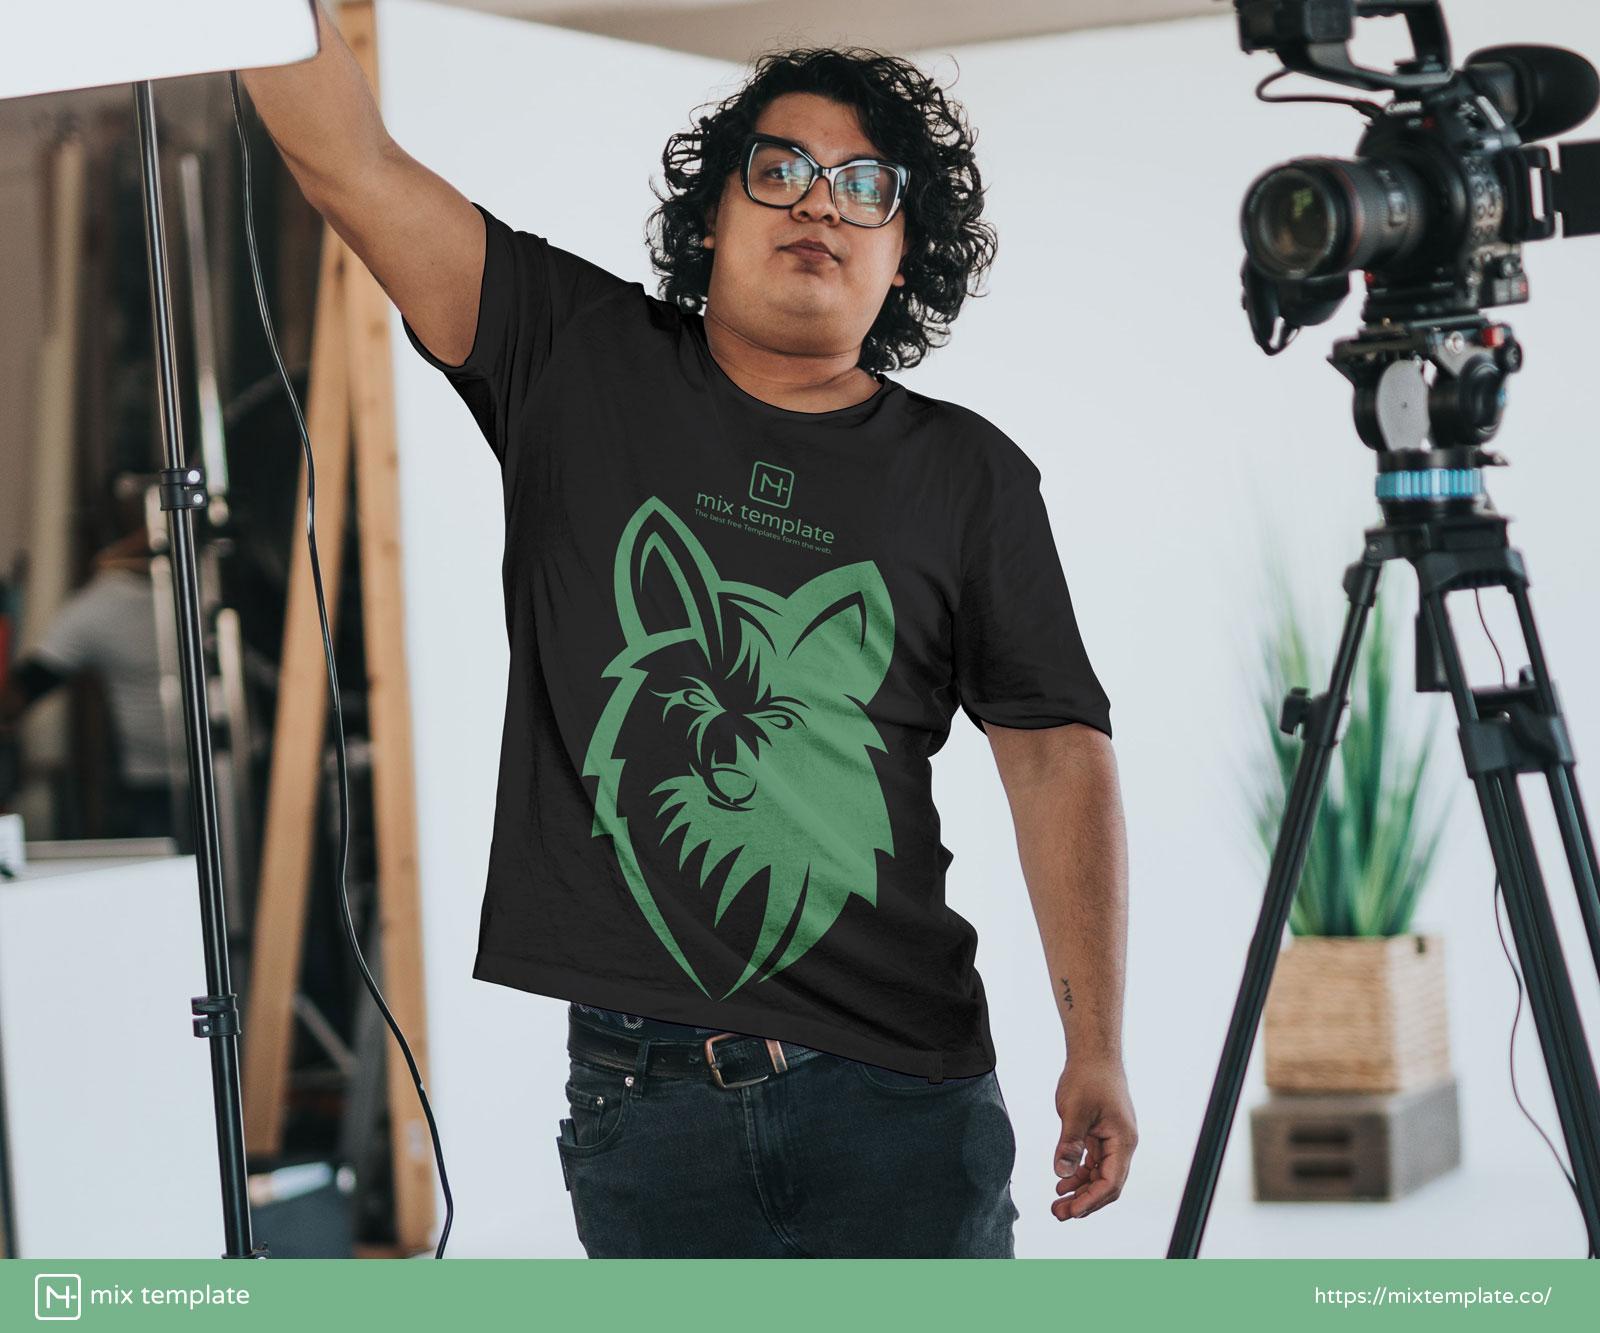 Free-Camera-Man-White-T-Shirt-Mockup-Template